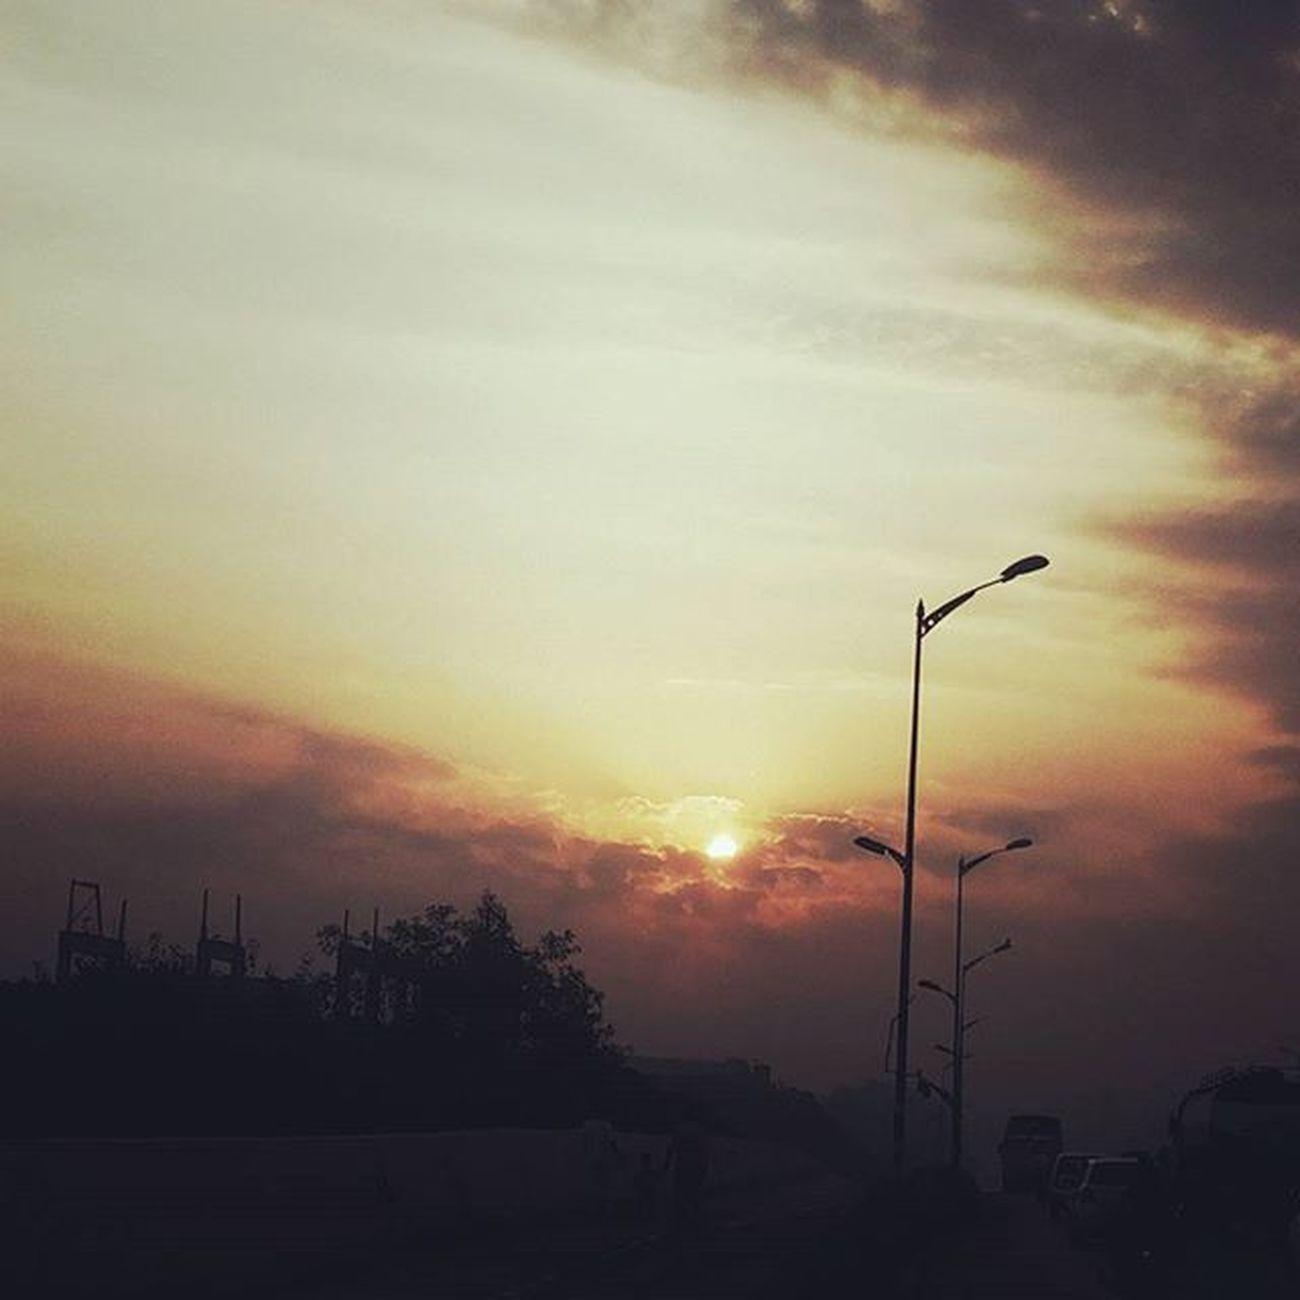 Good morning... Nature Naturelovers Natureclicks Amazing Colors Awesome Shades Instagram Alive  Green Red Sunrise India Maharashtra Pune Photooftheday Picoftheday Perfectnature Dm Camera Greenery Travel Weather Mobilephotography Samsung puneinstagrammers